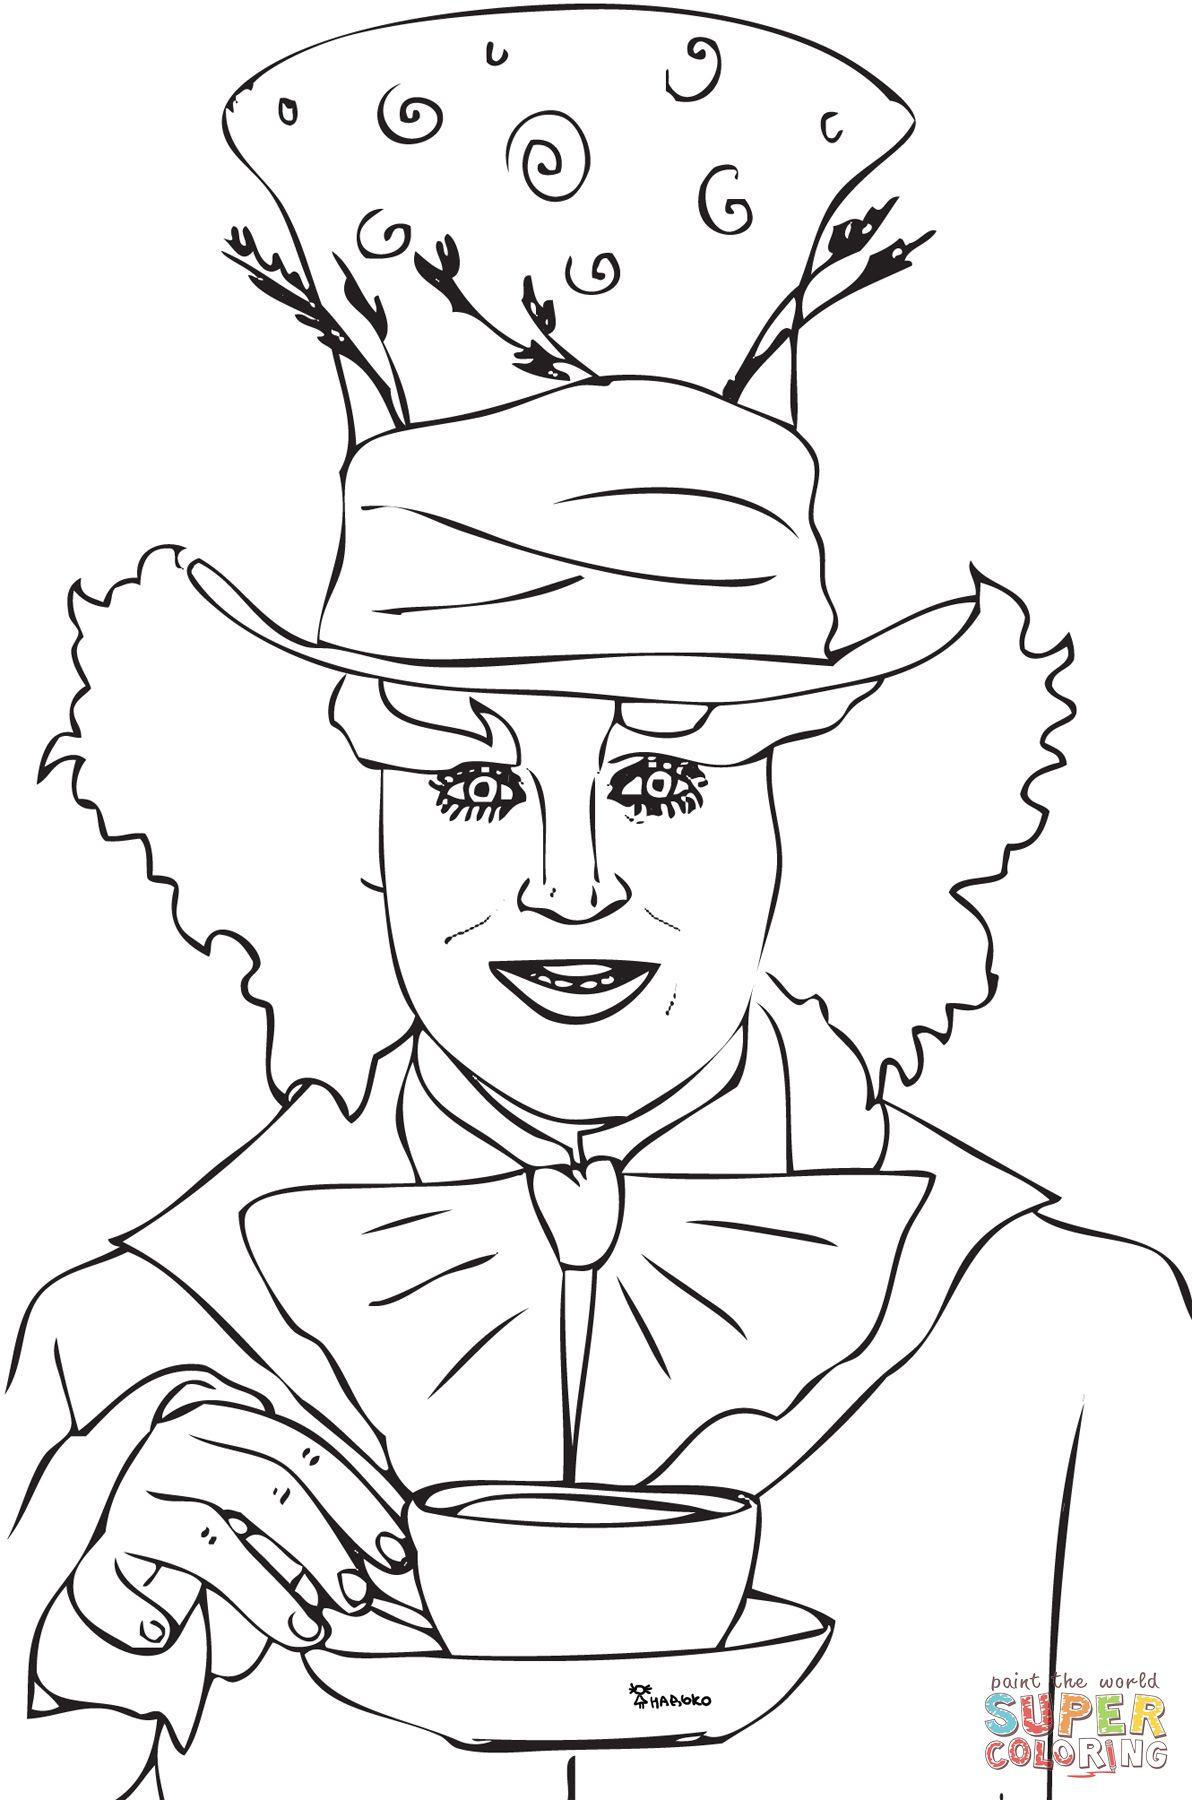 Free coloring pages alice in wonderland - Tim Burton Alice Cartoon Google Search